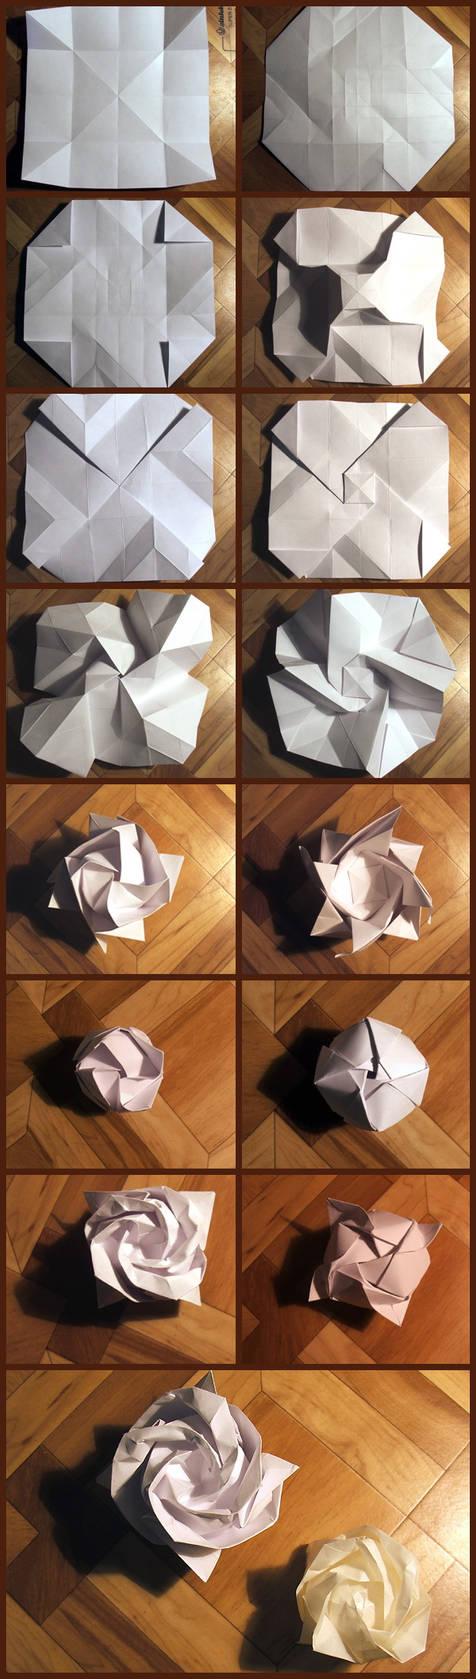 Origami Kawasaki Rose by Toshikazu Kawasaki | Go Origami | 1679x476